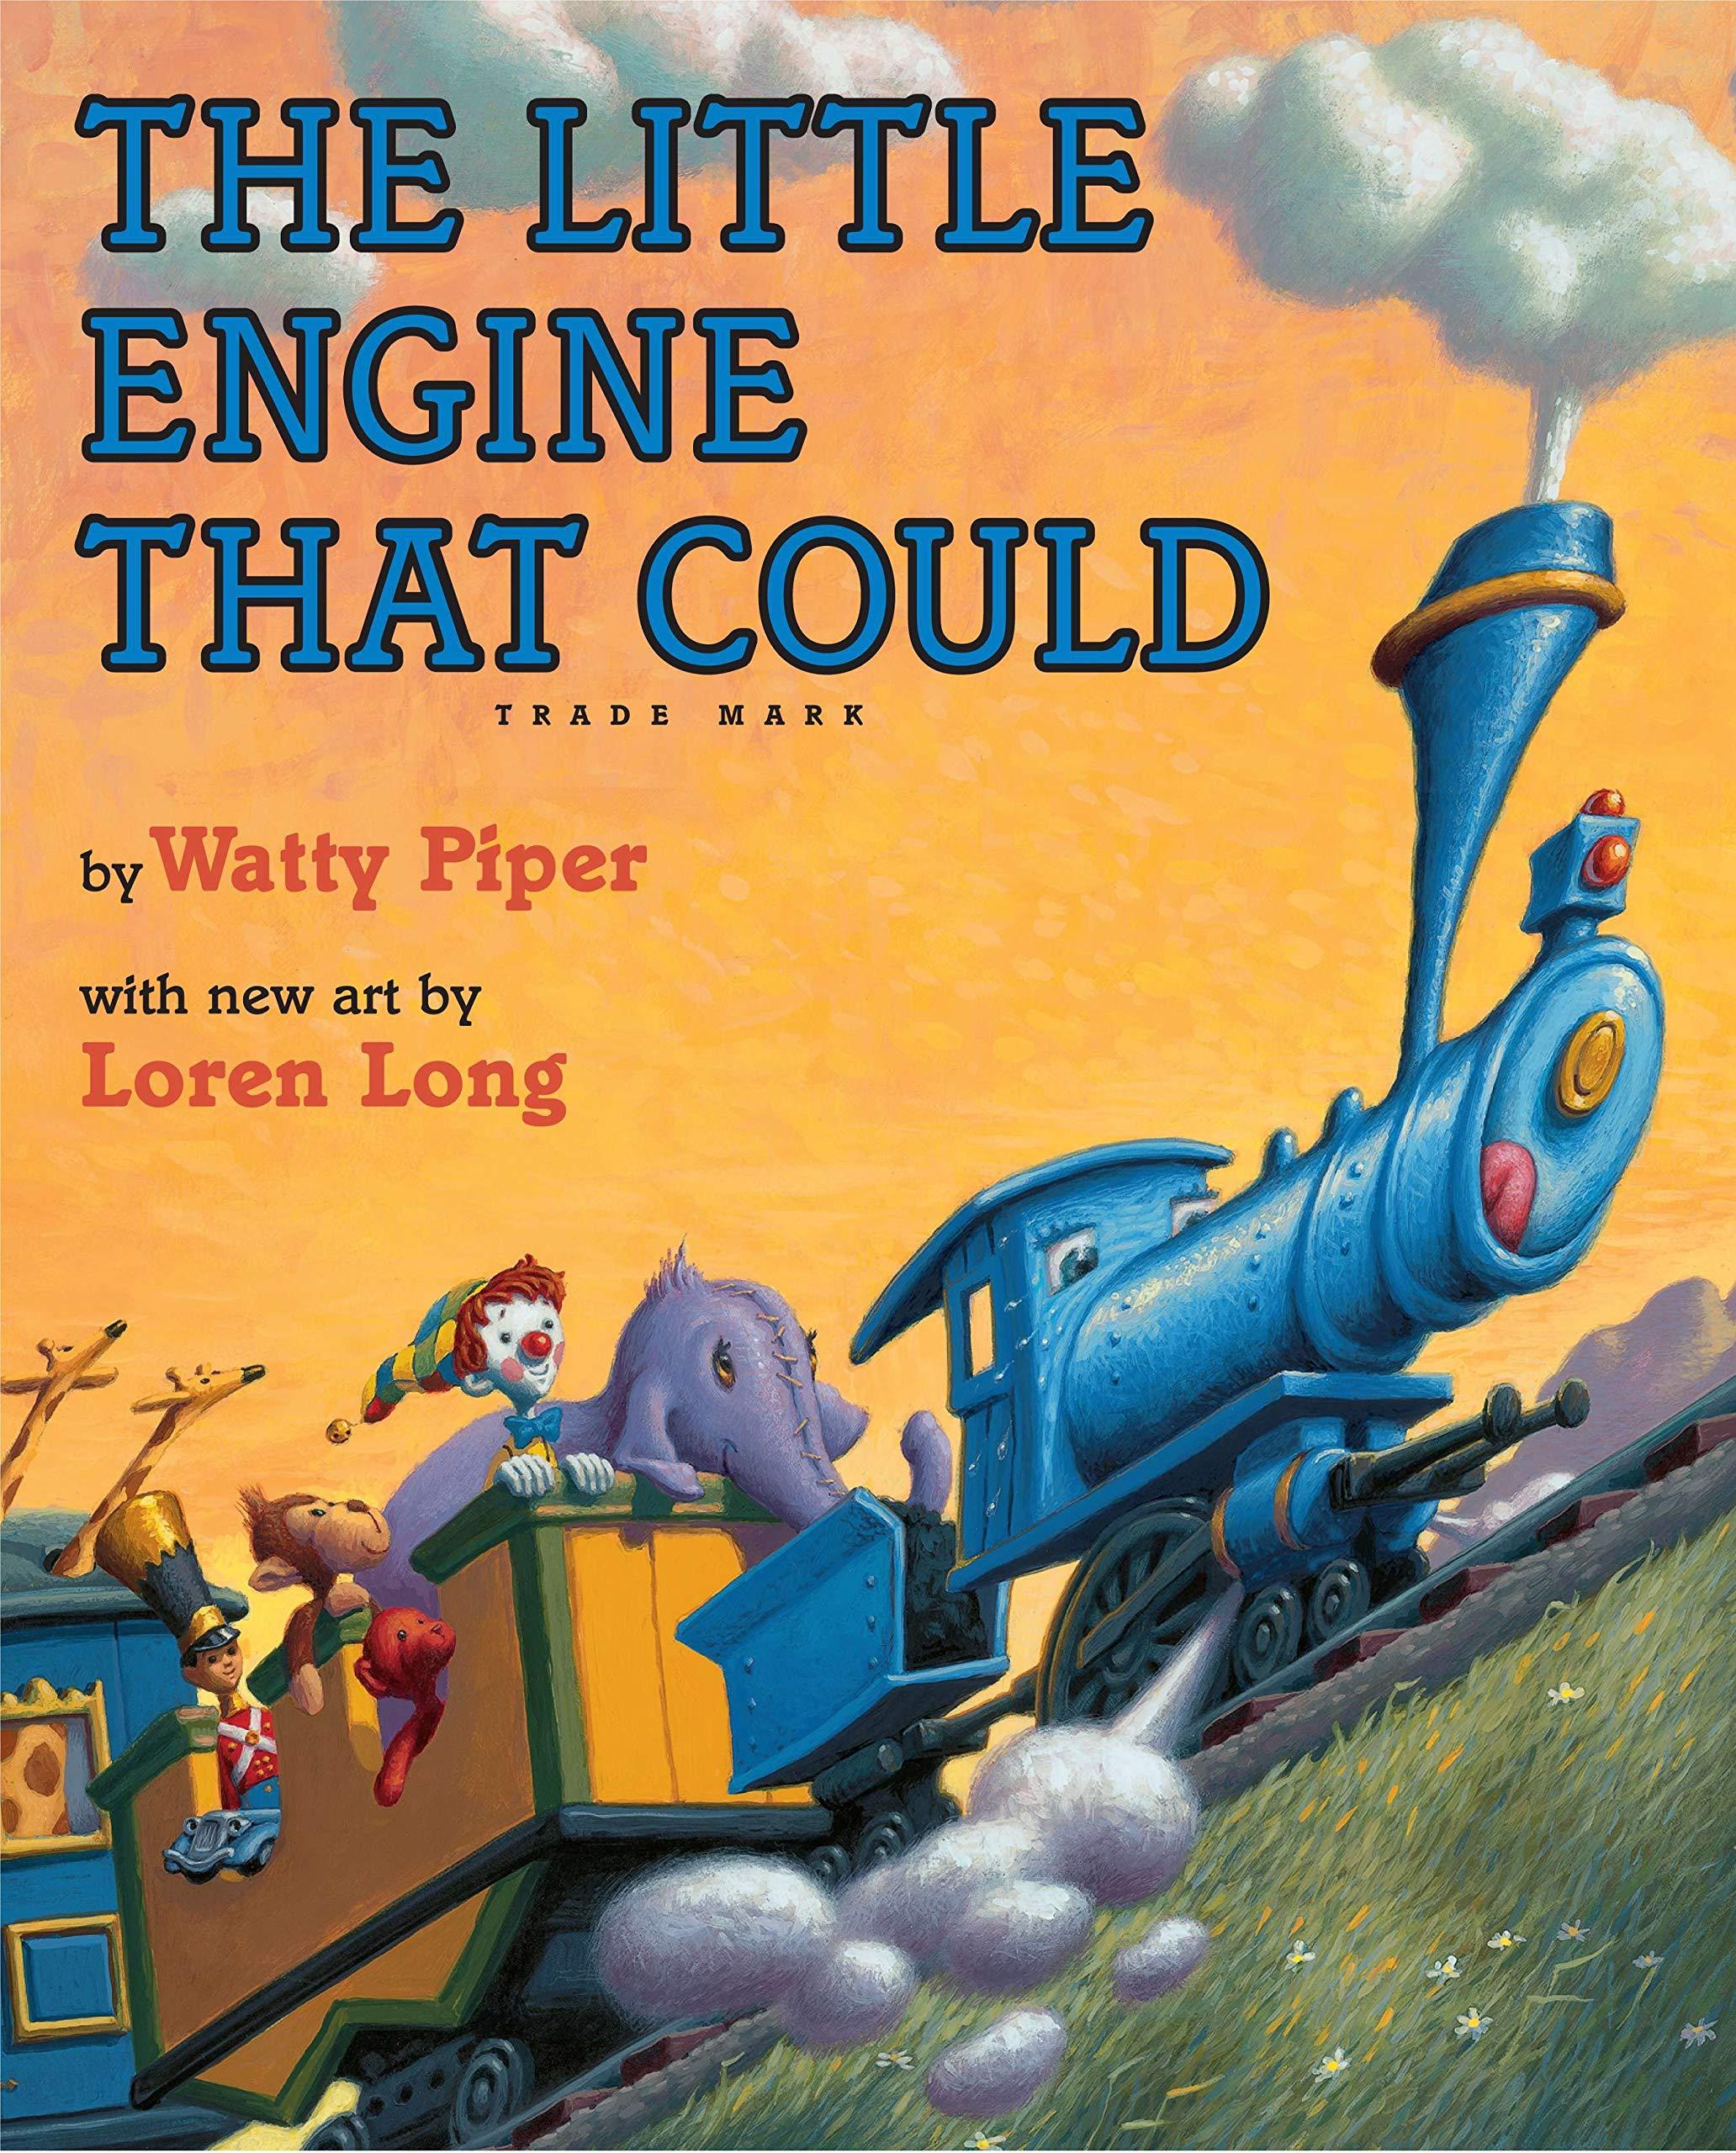 The Little Engine That Could: Loren Long Edition: Piper, Watty, Long, Loren: 9780399244674: Amazon.com: Books